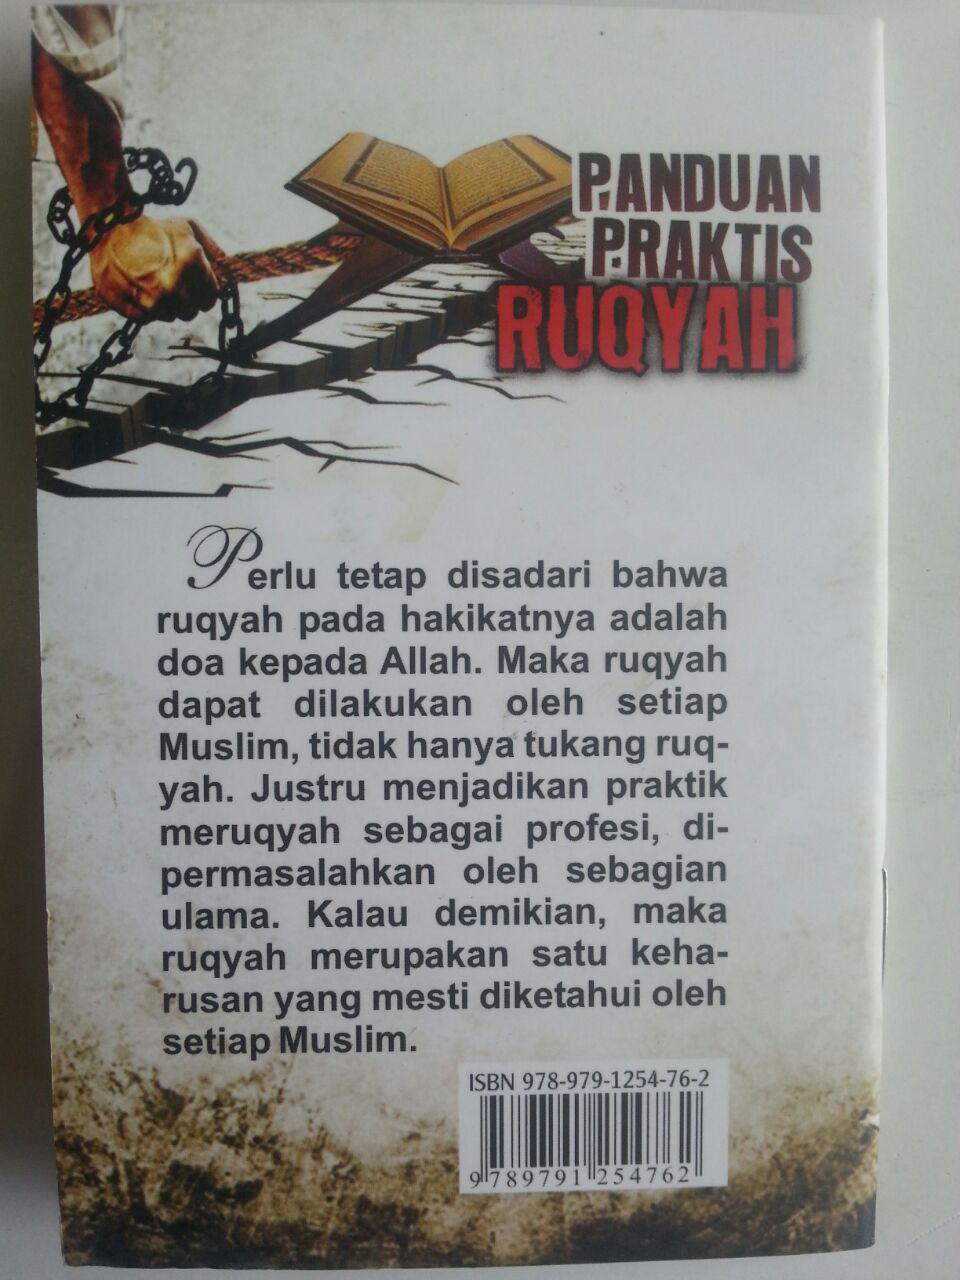 Buku Saku Panduan Praktis Ruqyah Sesuai Al-Quran As-Sunnah isi 3